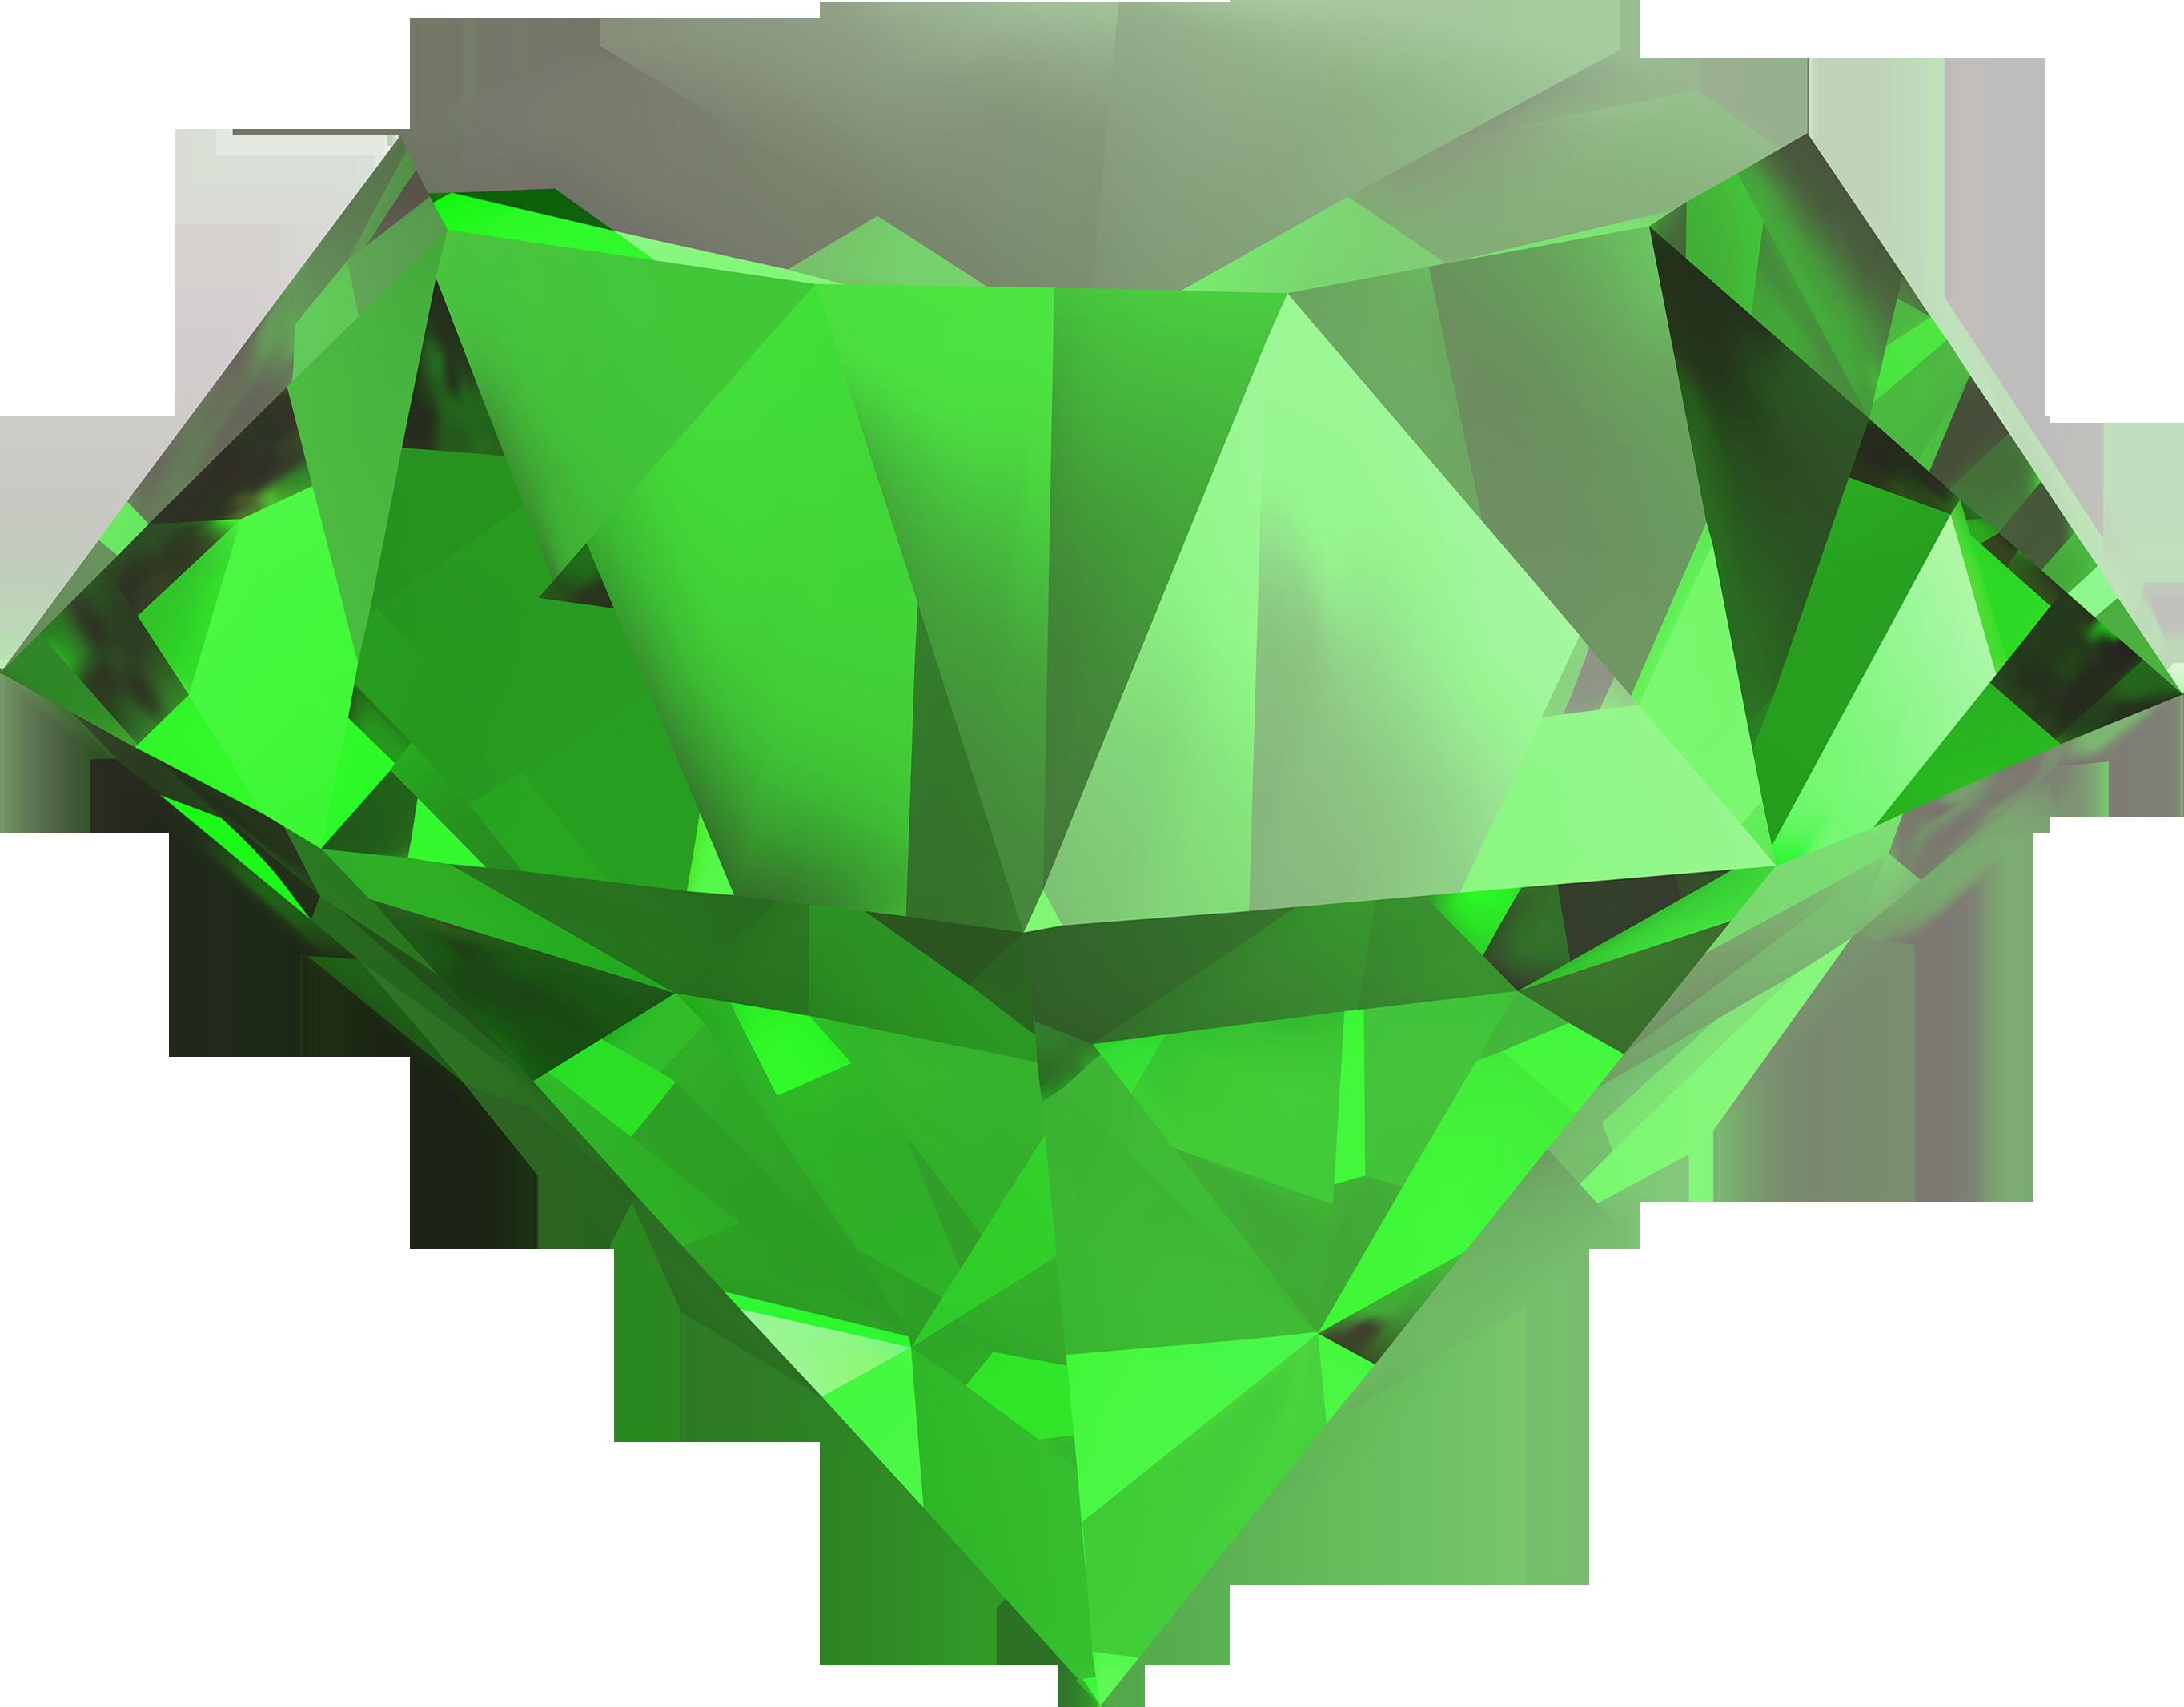 Diamonds clipart mineral. Diamond emerald png image